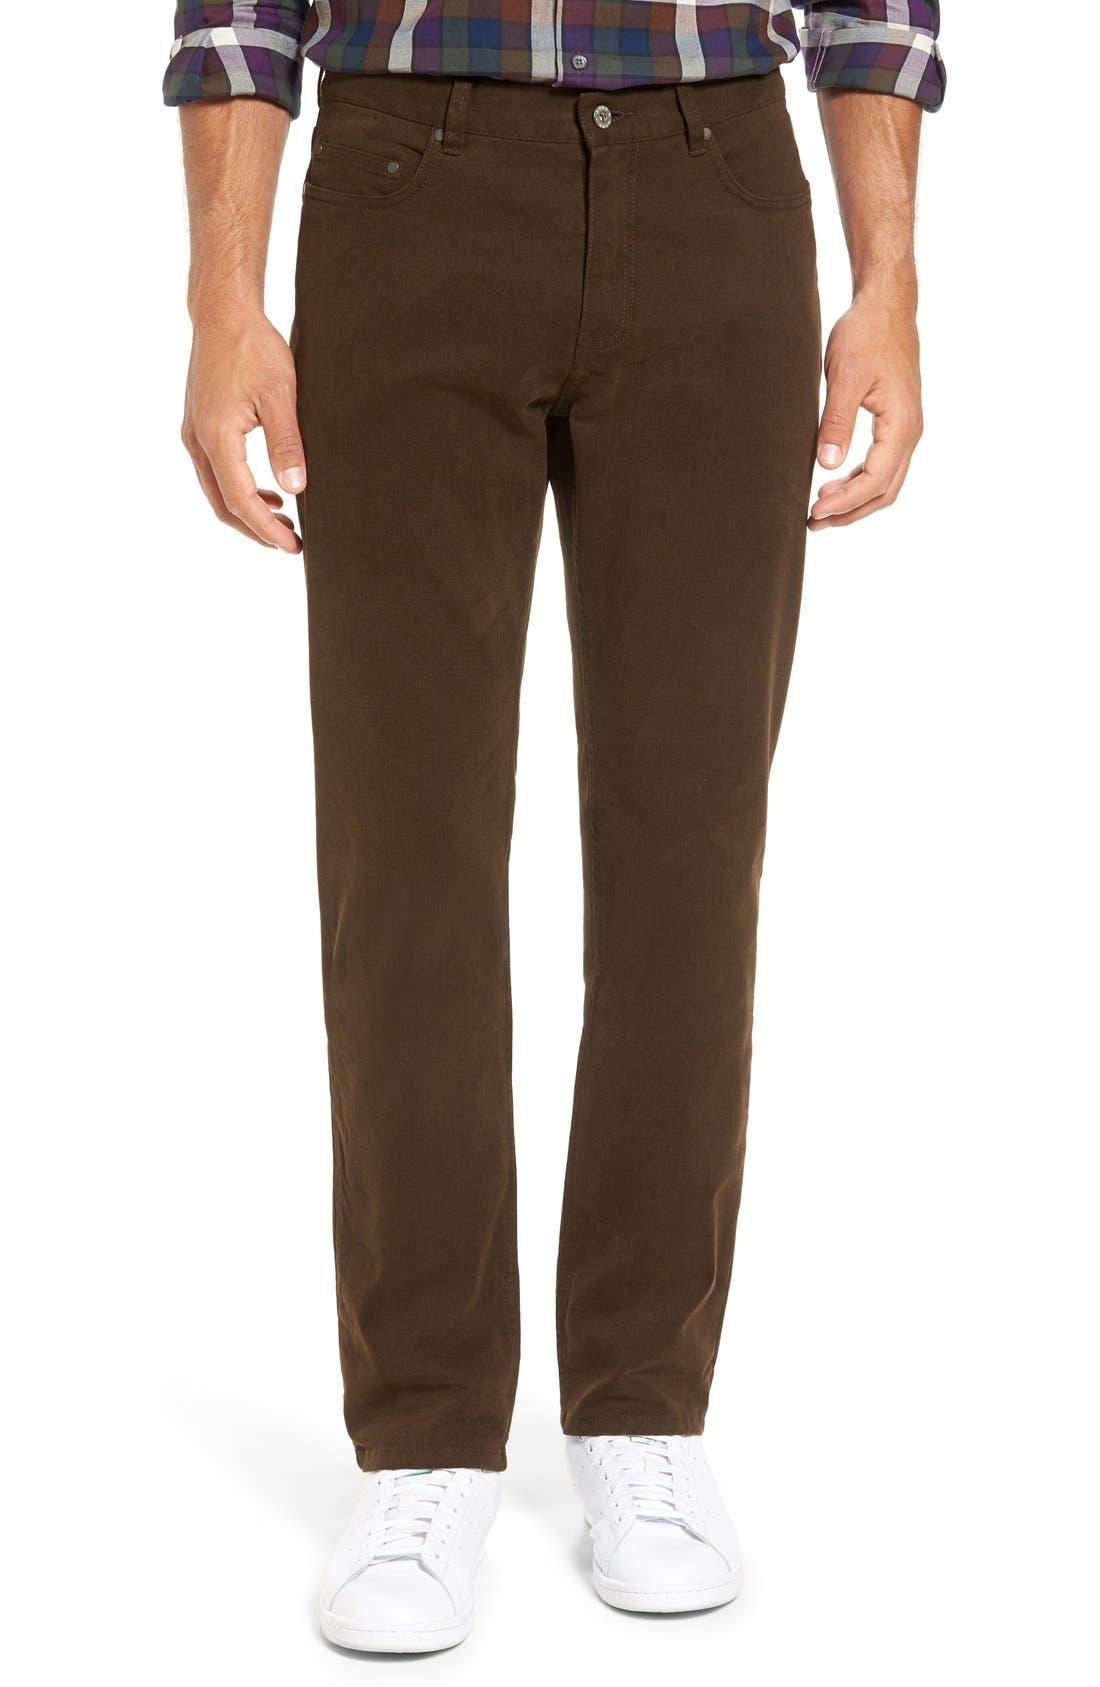 'Barters' Straight Leg Twill Pants,                             Main thumbnail 1, color,                             Dark Tobacco